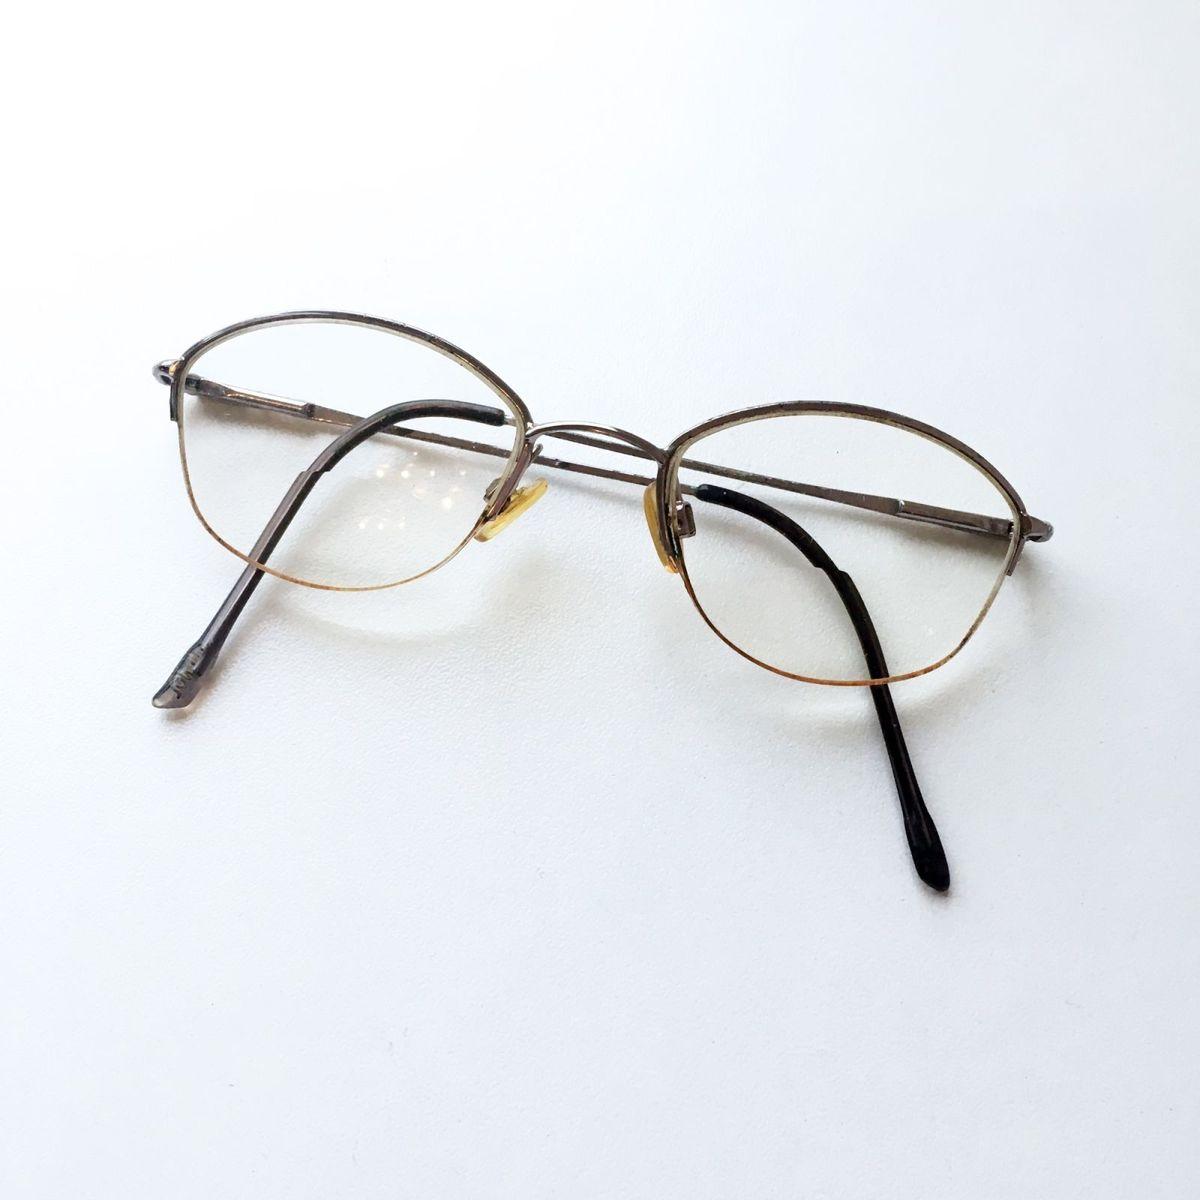 a728892390878 Armação Óculos Oval Meio Aro Metal Retrô   Óculos Feminino Tecnol ...